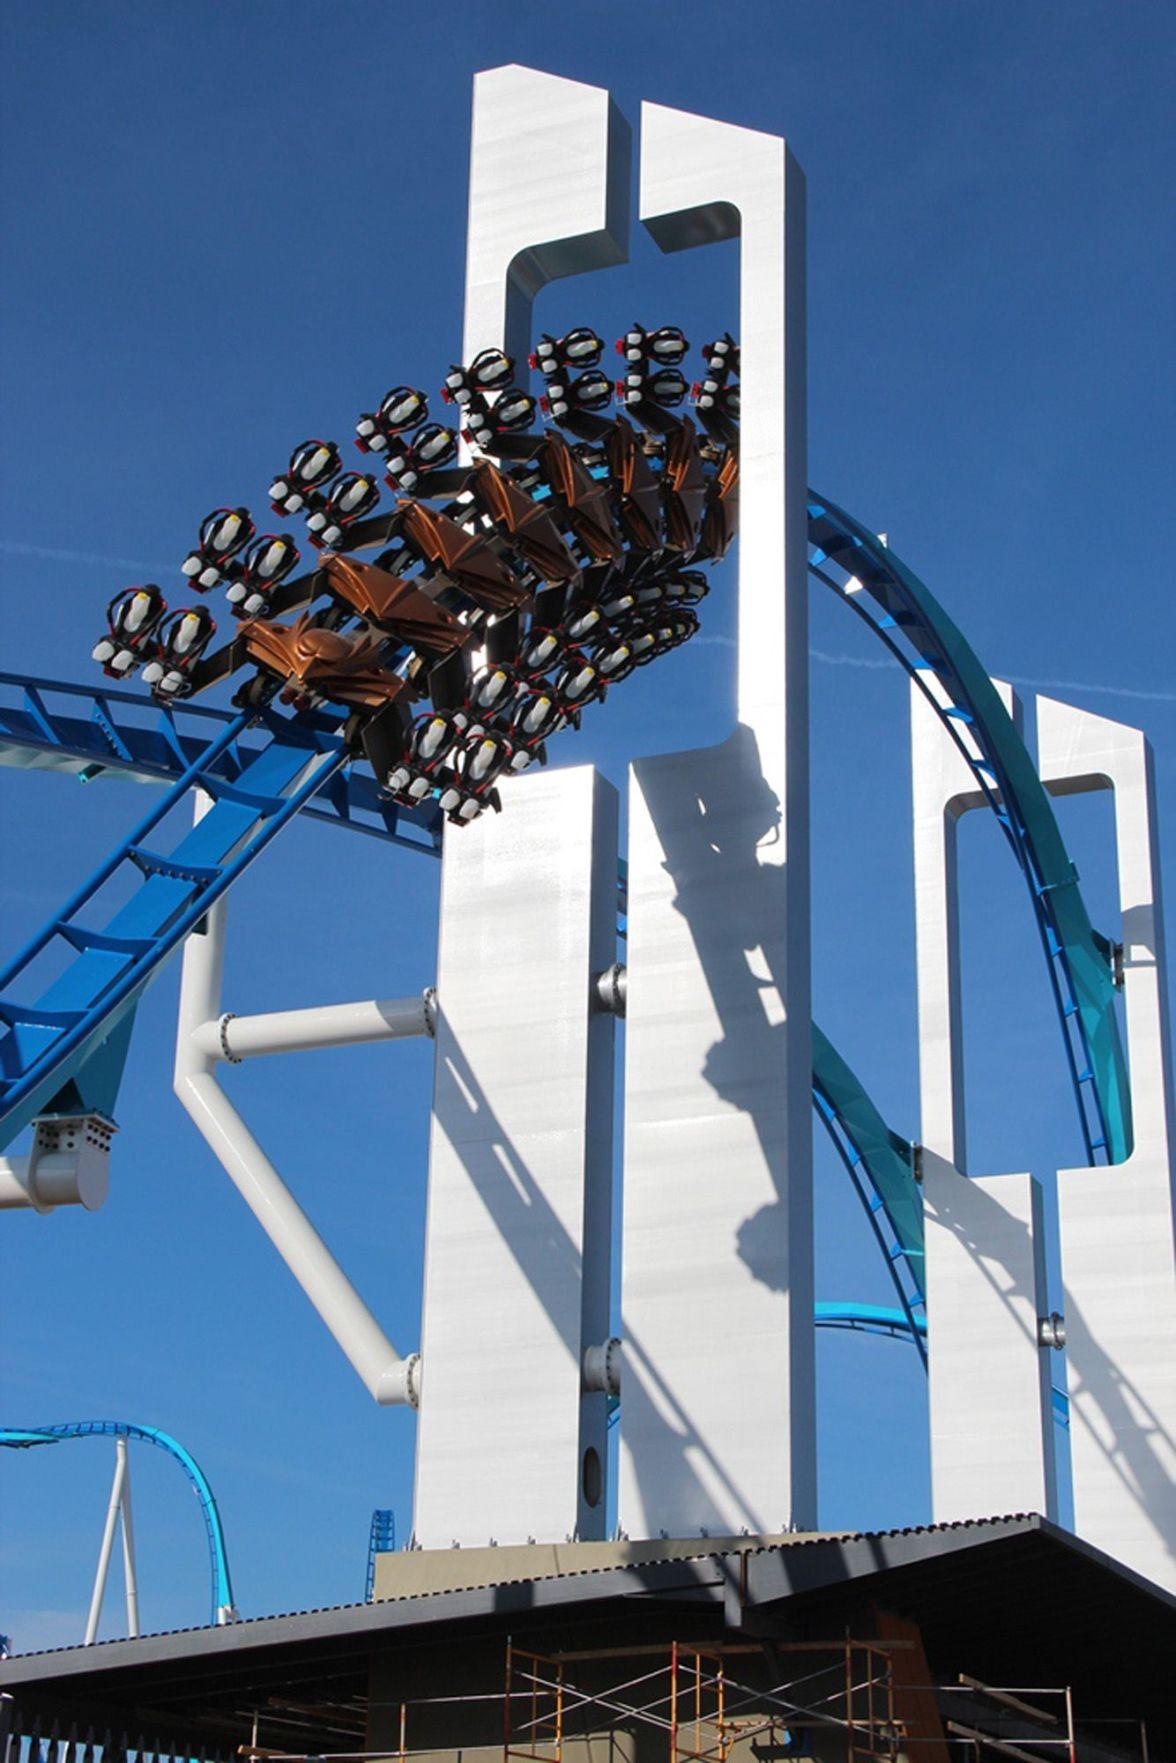 Theme parks offer new thrills